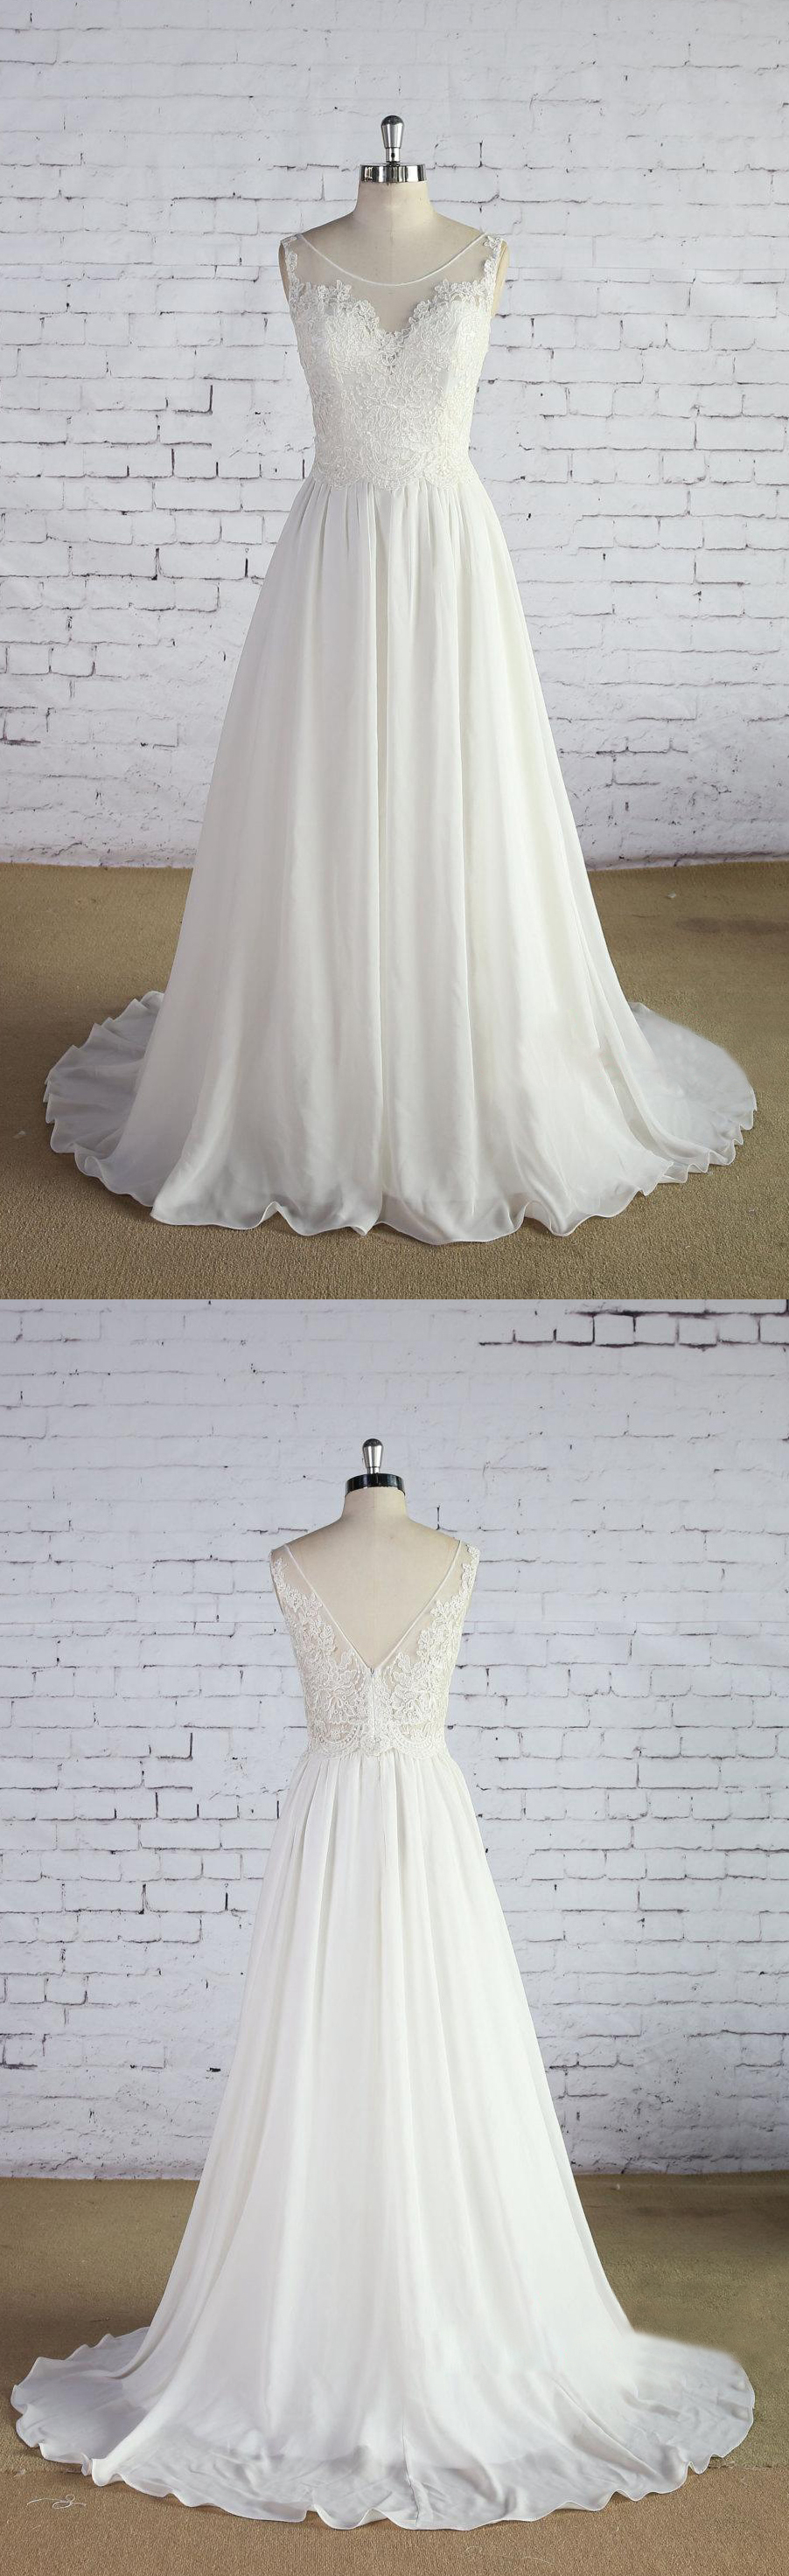 Gold belt for wedding dress  Pin by June Bridals on Wedding Dress on Mannequin  Pinterest